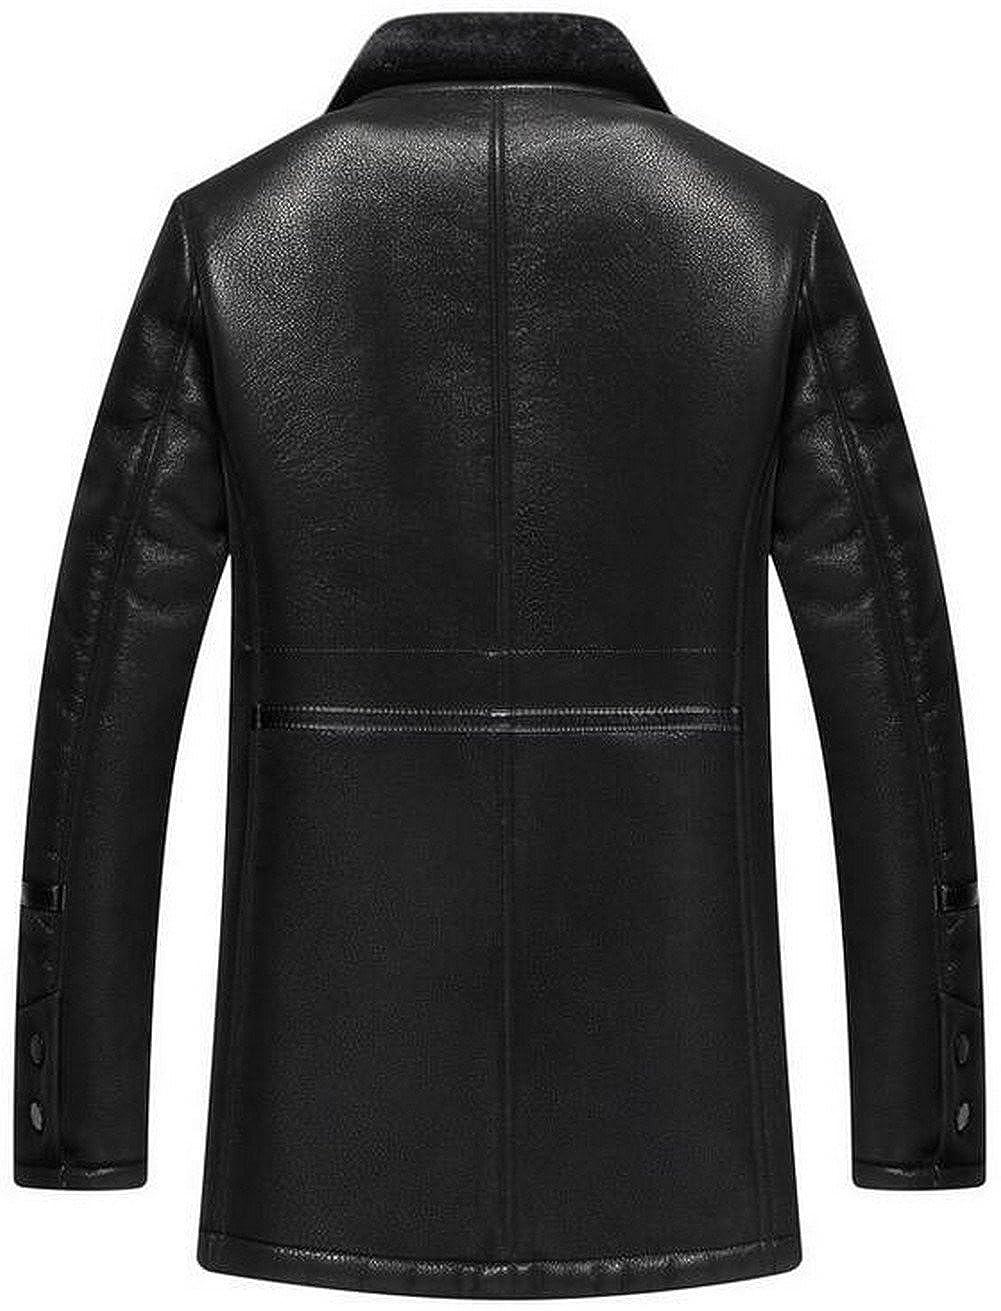 a67d7486c moxishop Men s Blazer Lapel Sheepskin Leather Fur Coat Warm Winter ...